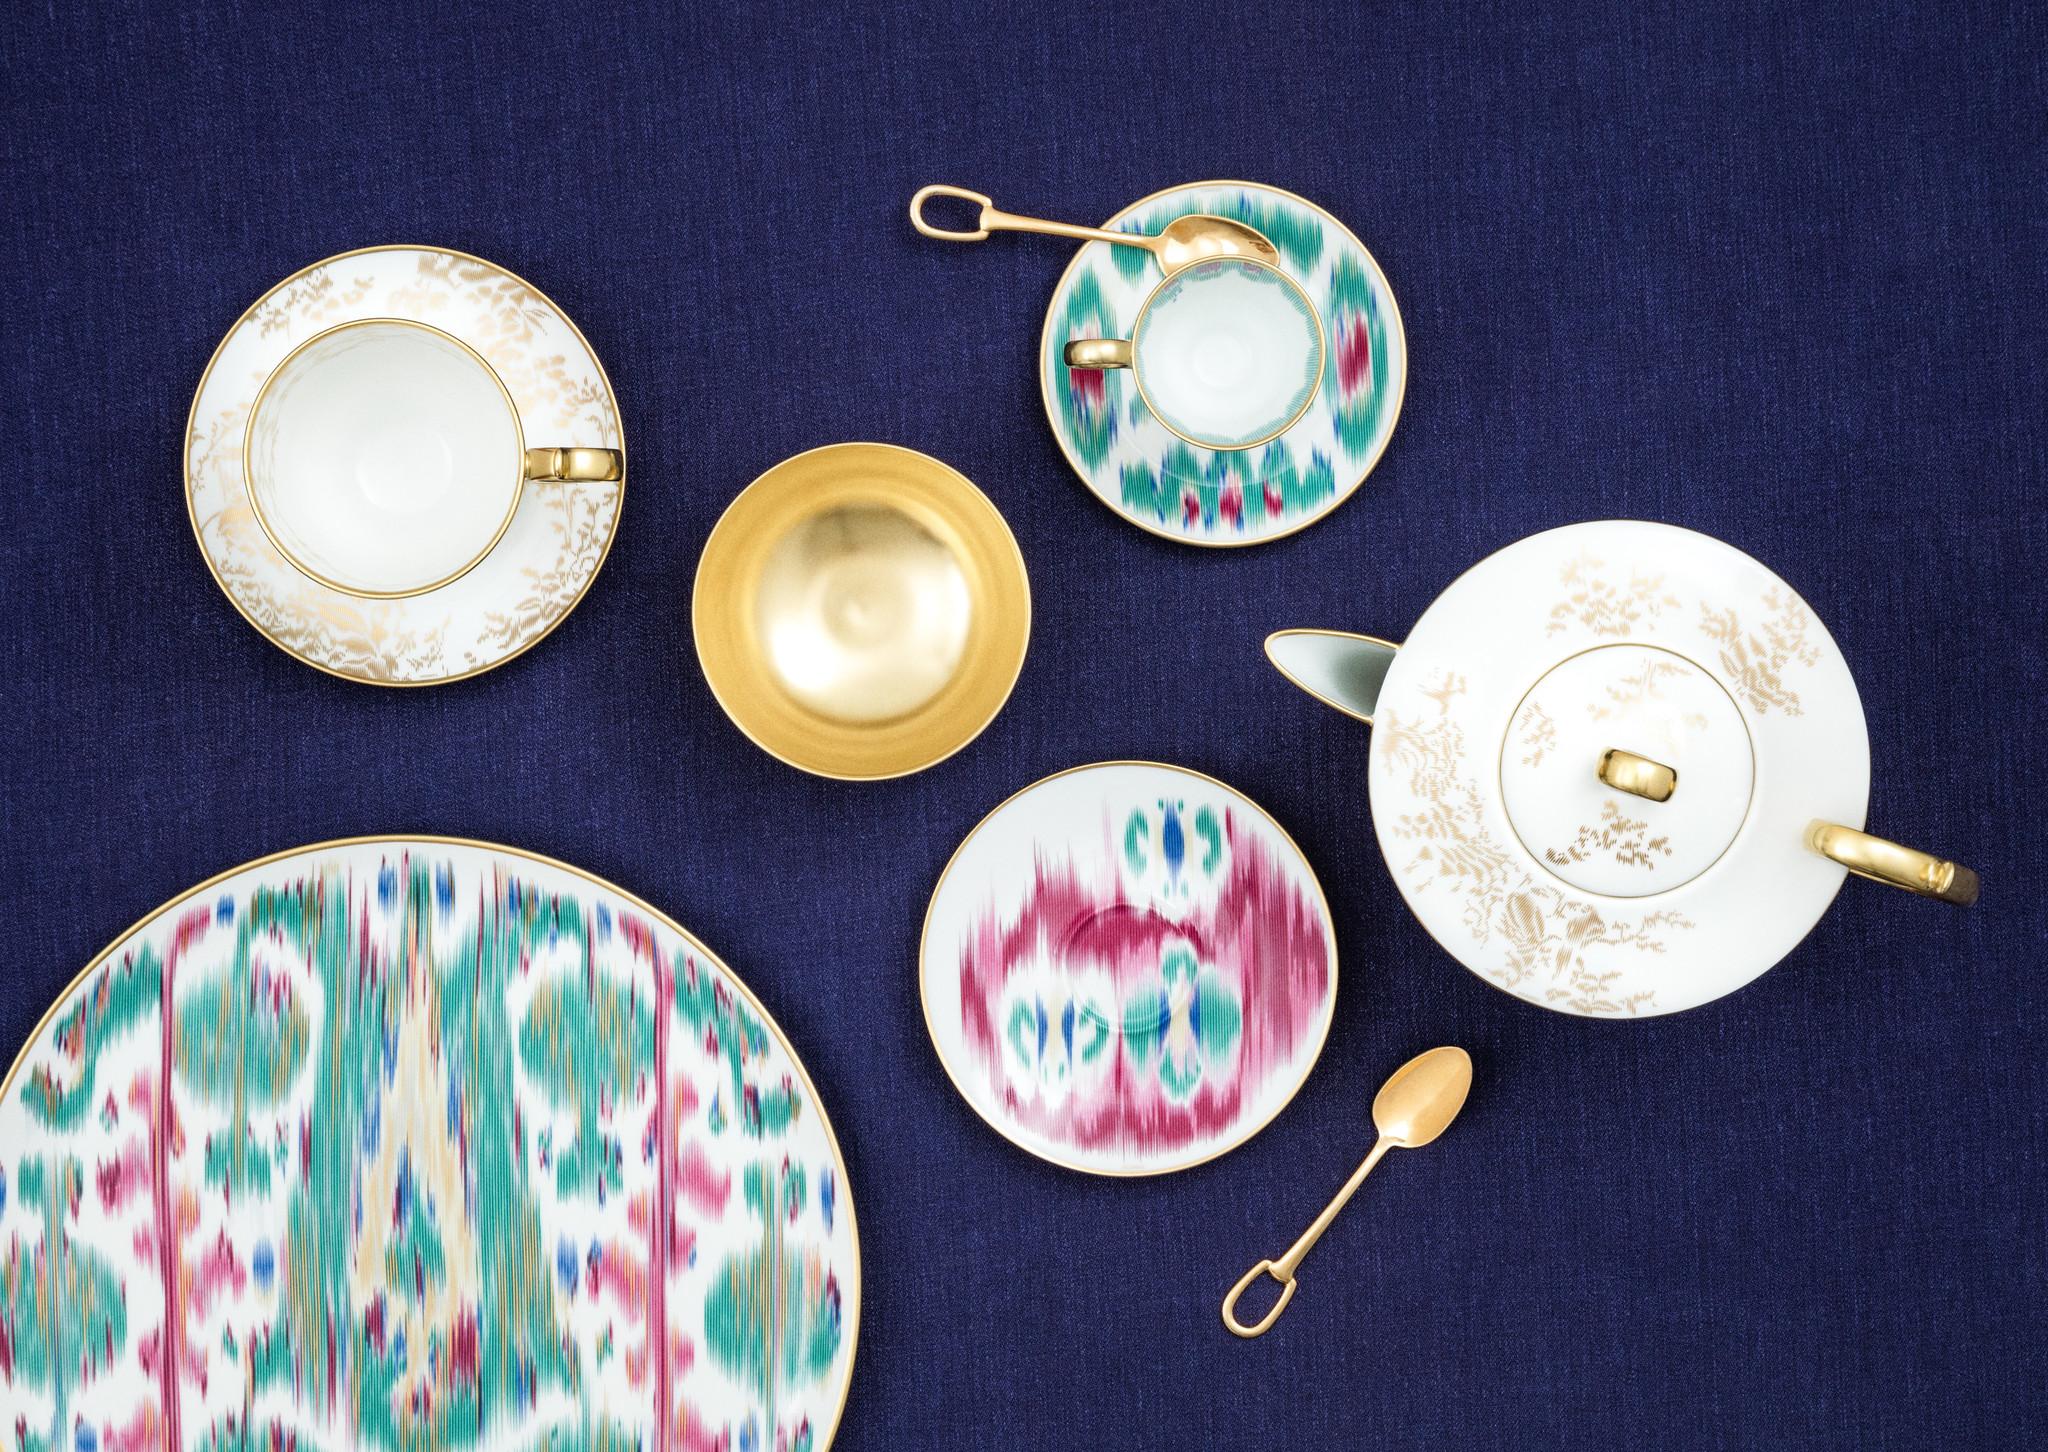 Hermes Voyage en Ikat Bread and Butter Plate